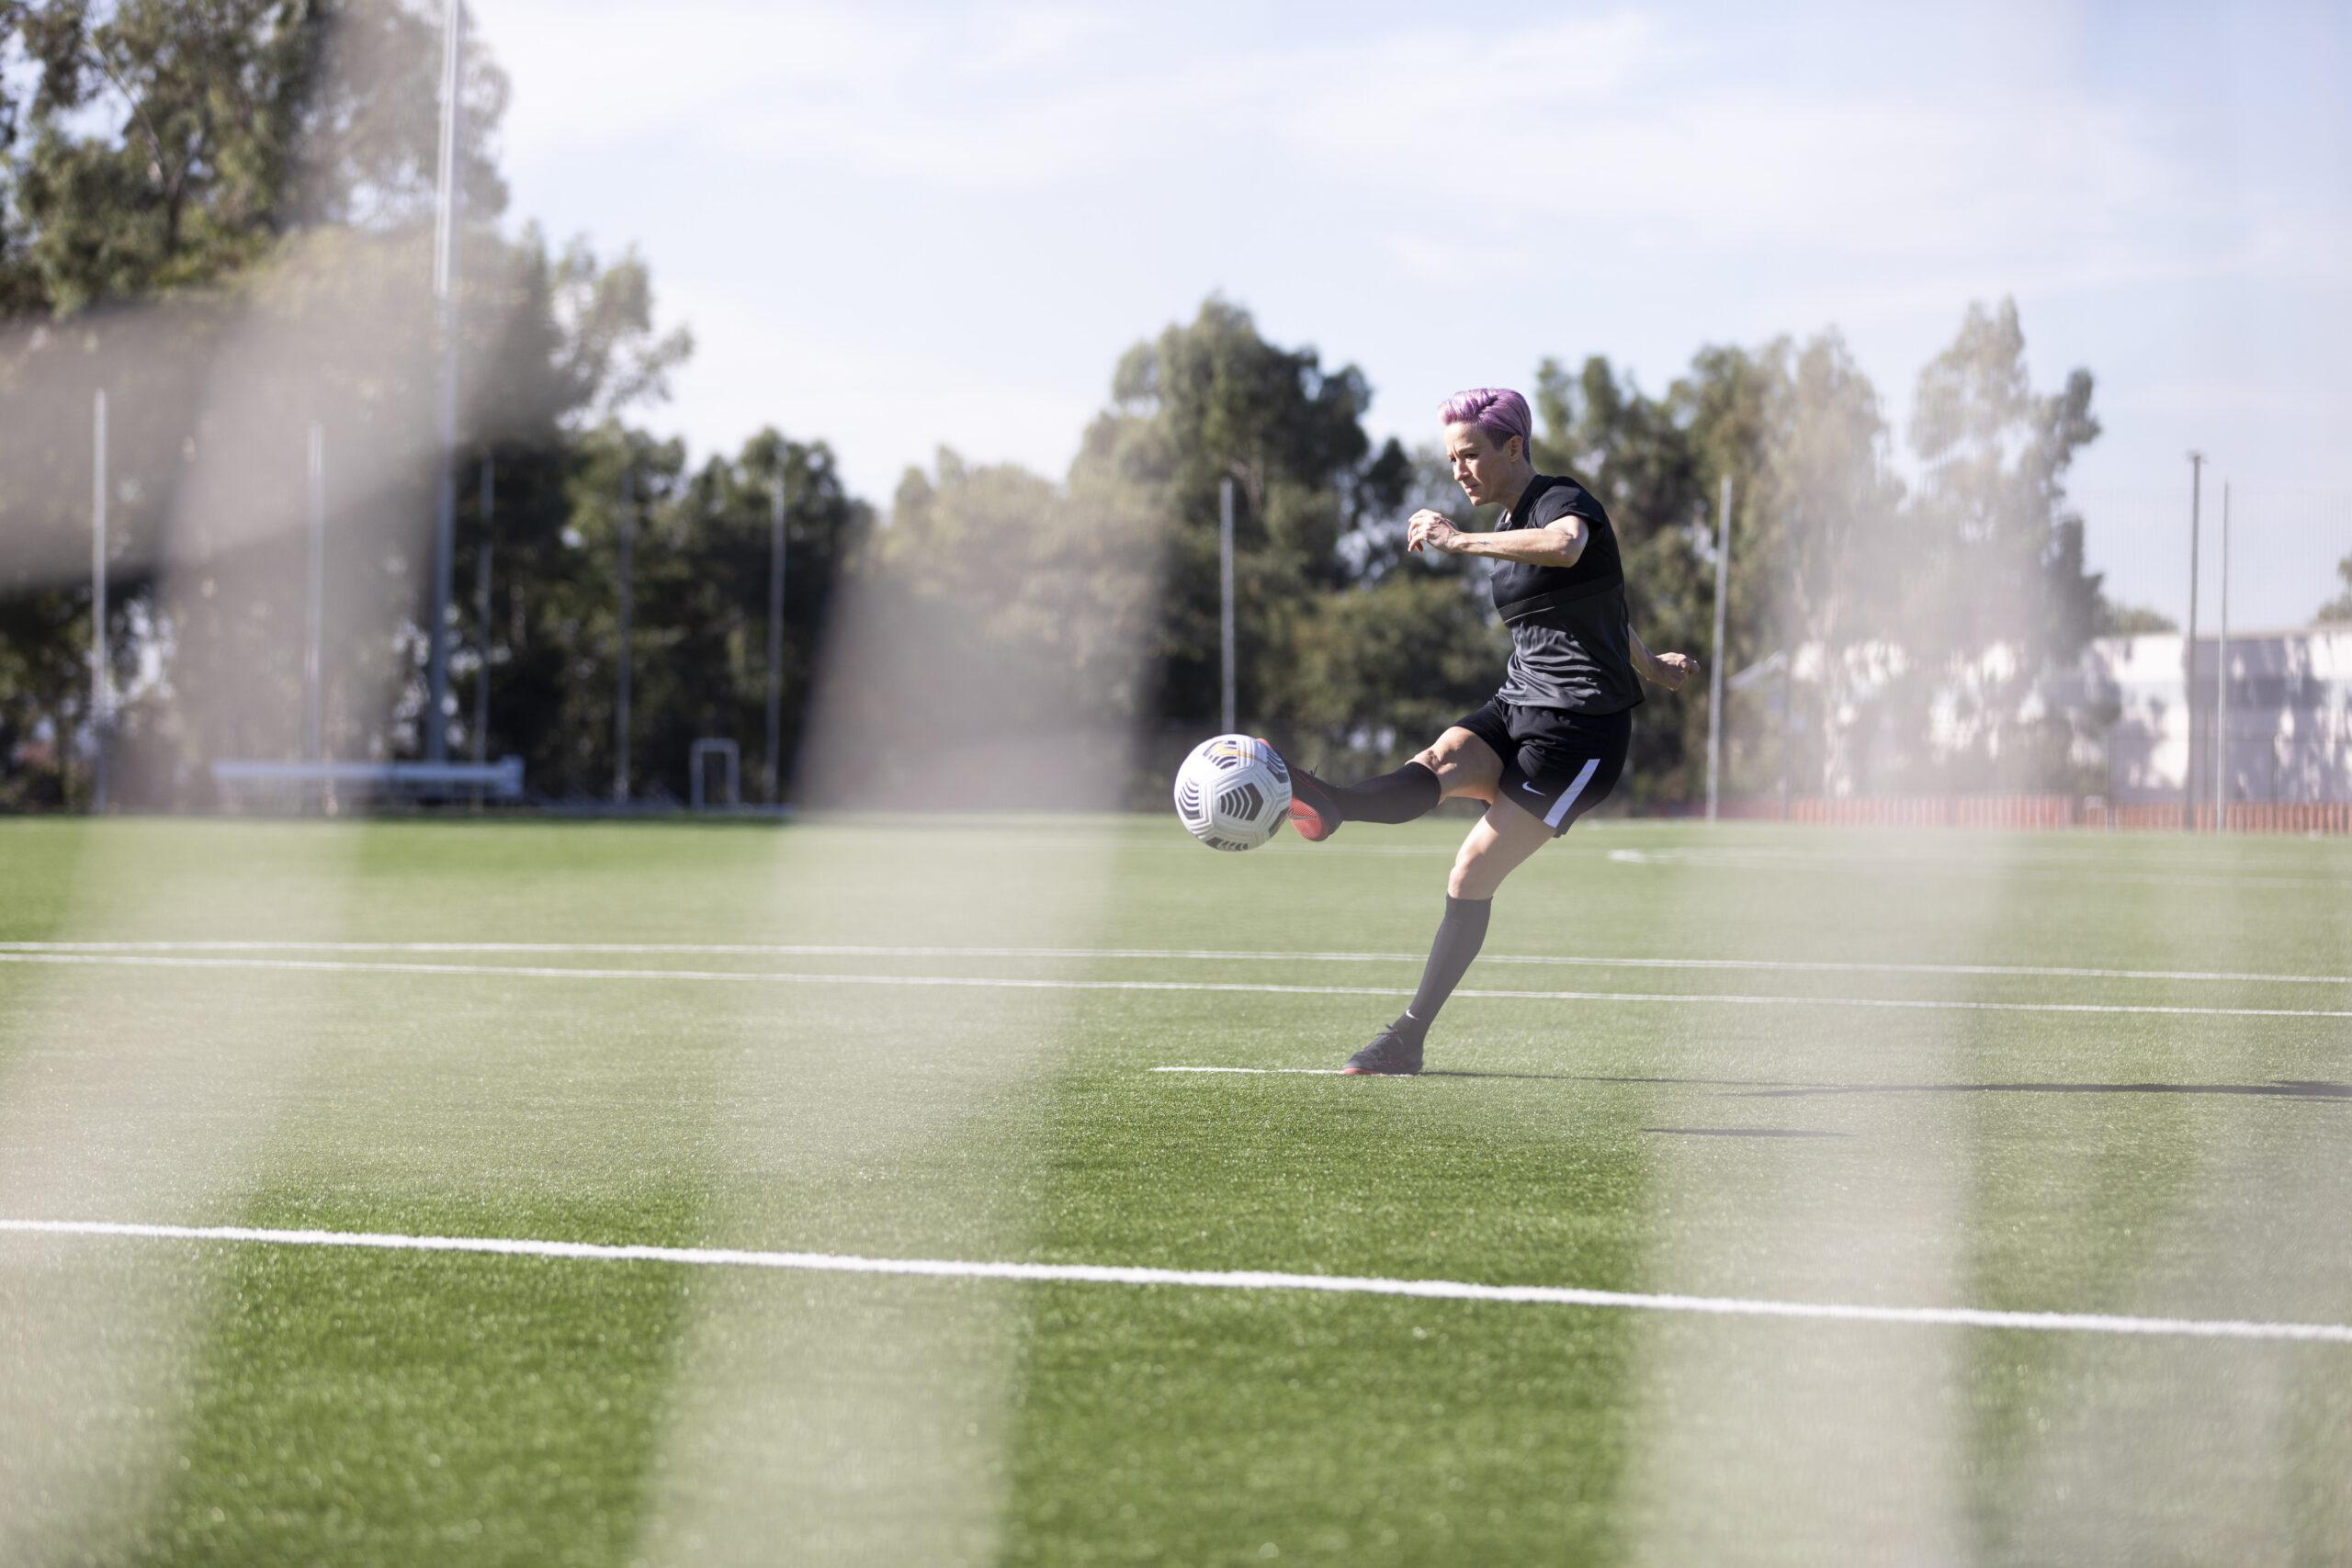 Sabrina Hill photographs Megan Rapinoa as she shoots she scores for the Skills